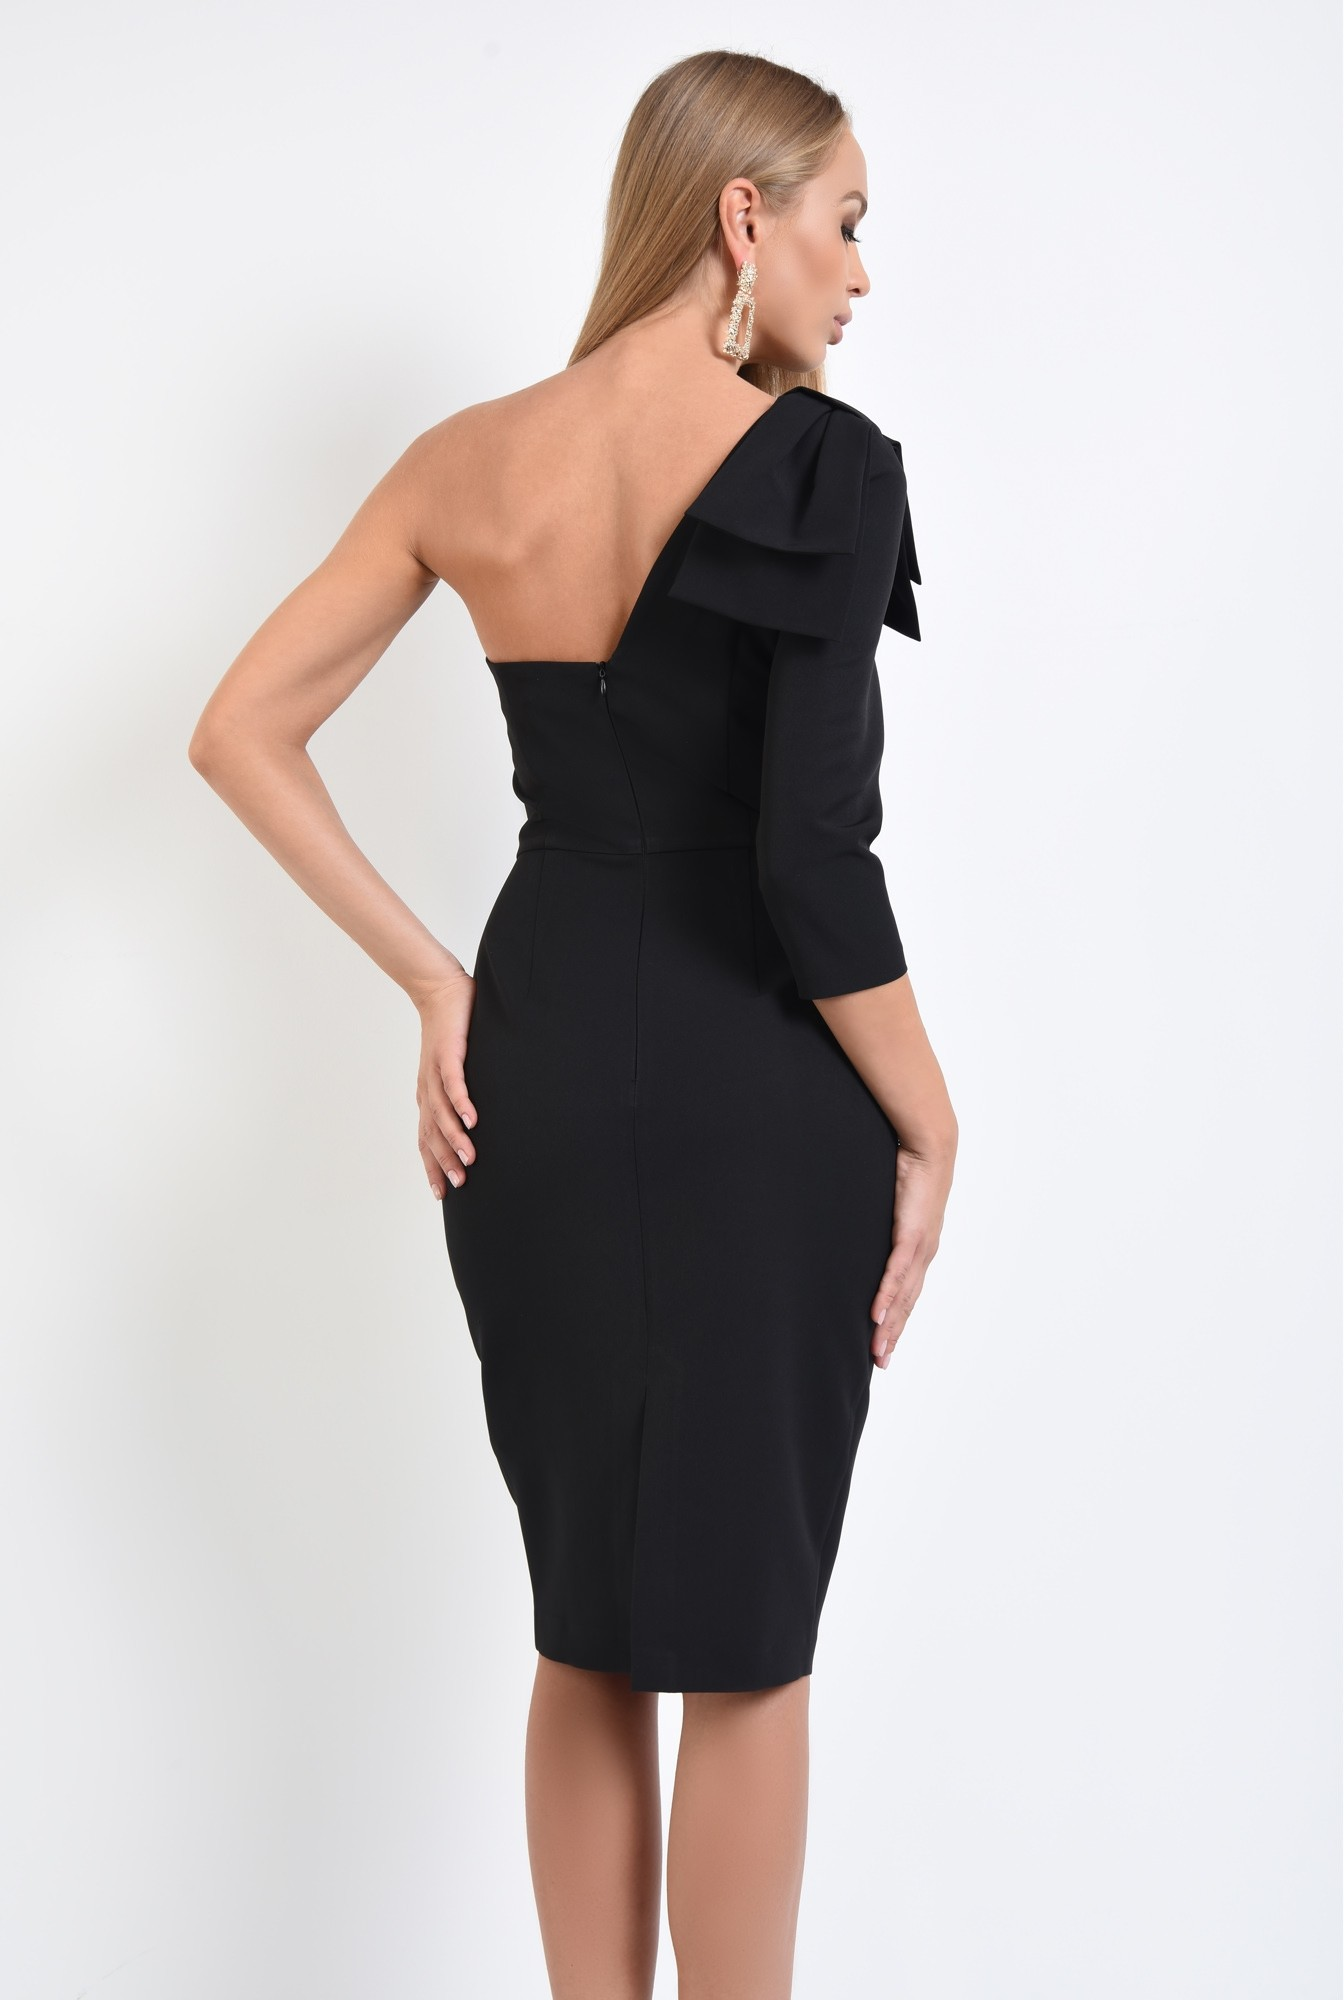 1 - 360 - rochie eleganta, conica, neagra, funda suprapusa la umar